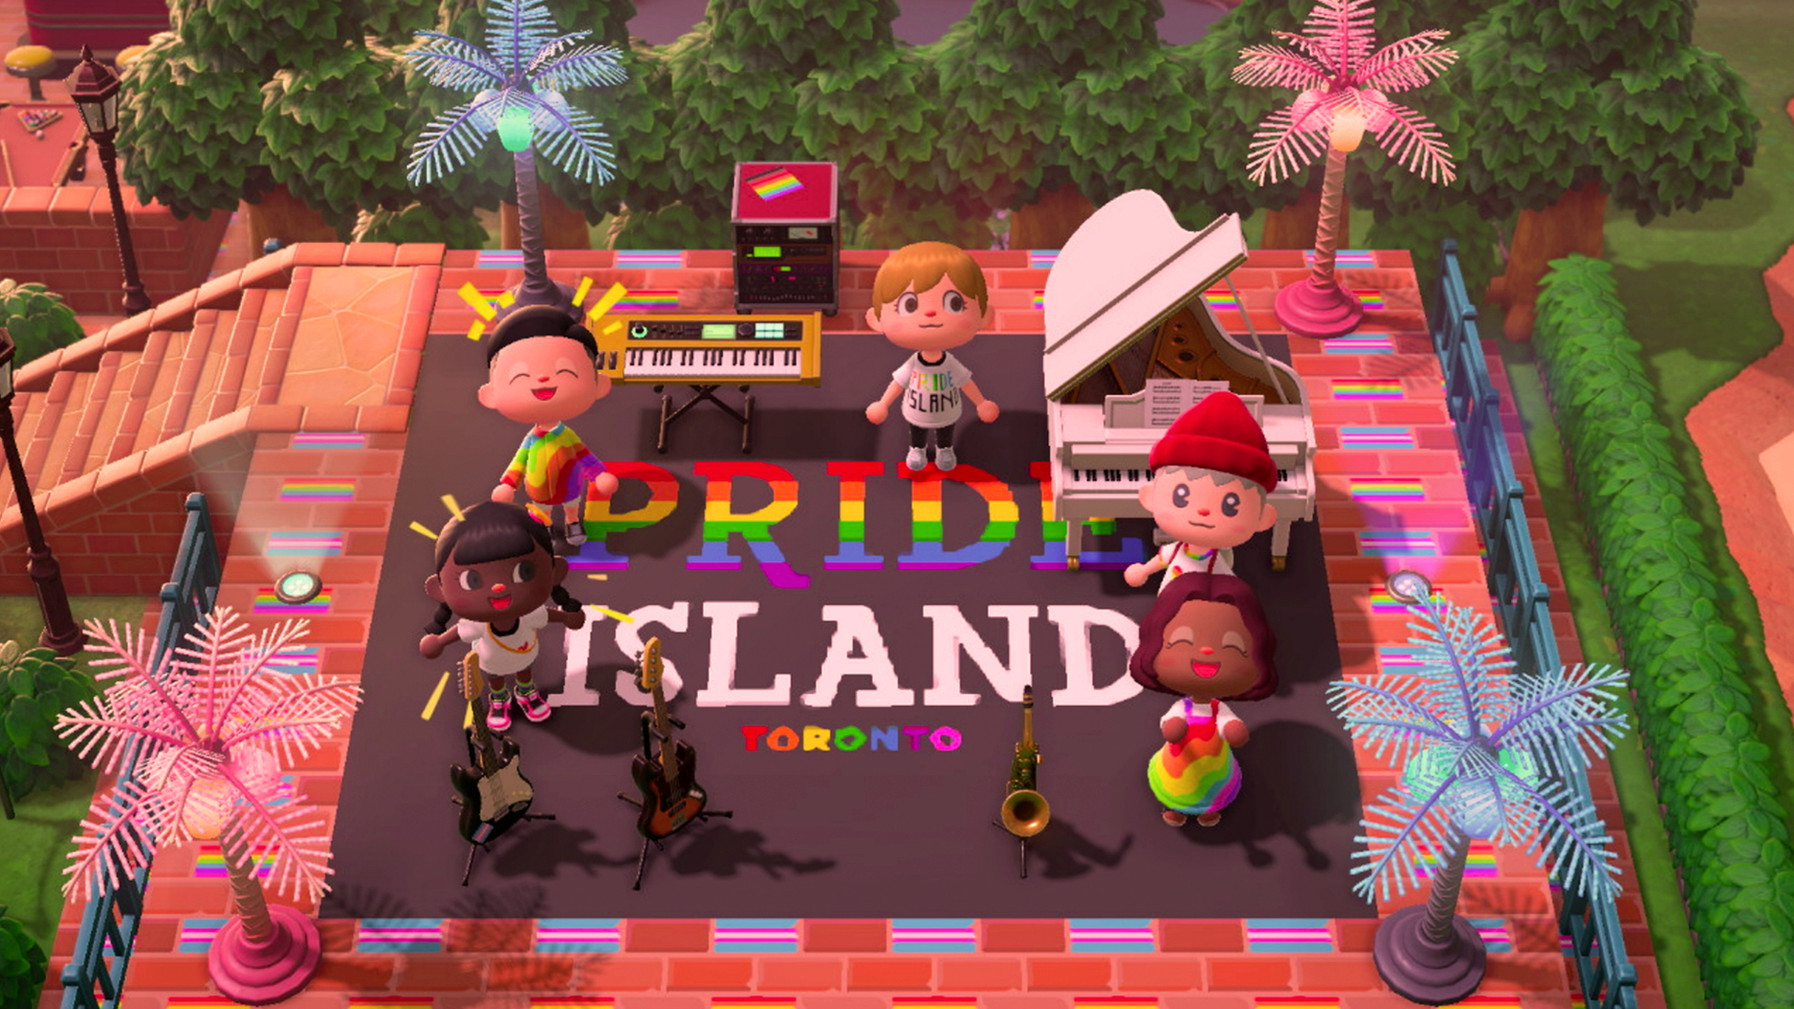 PrideIsland_03.jpg